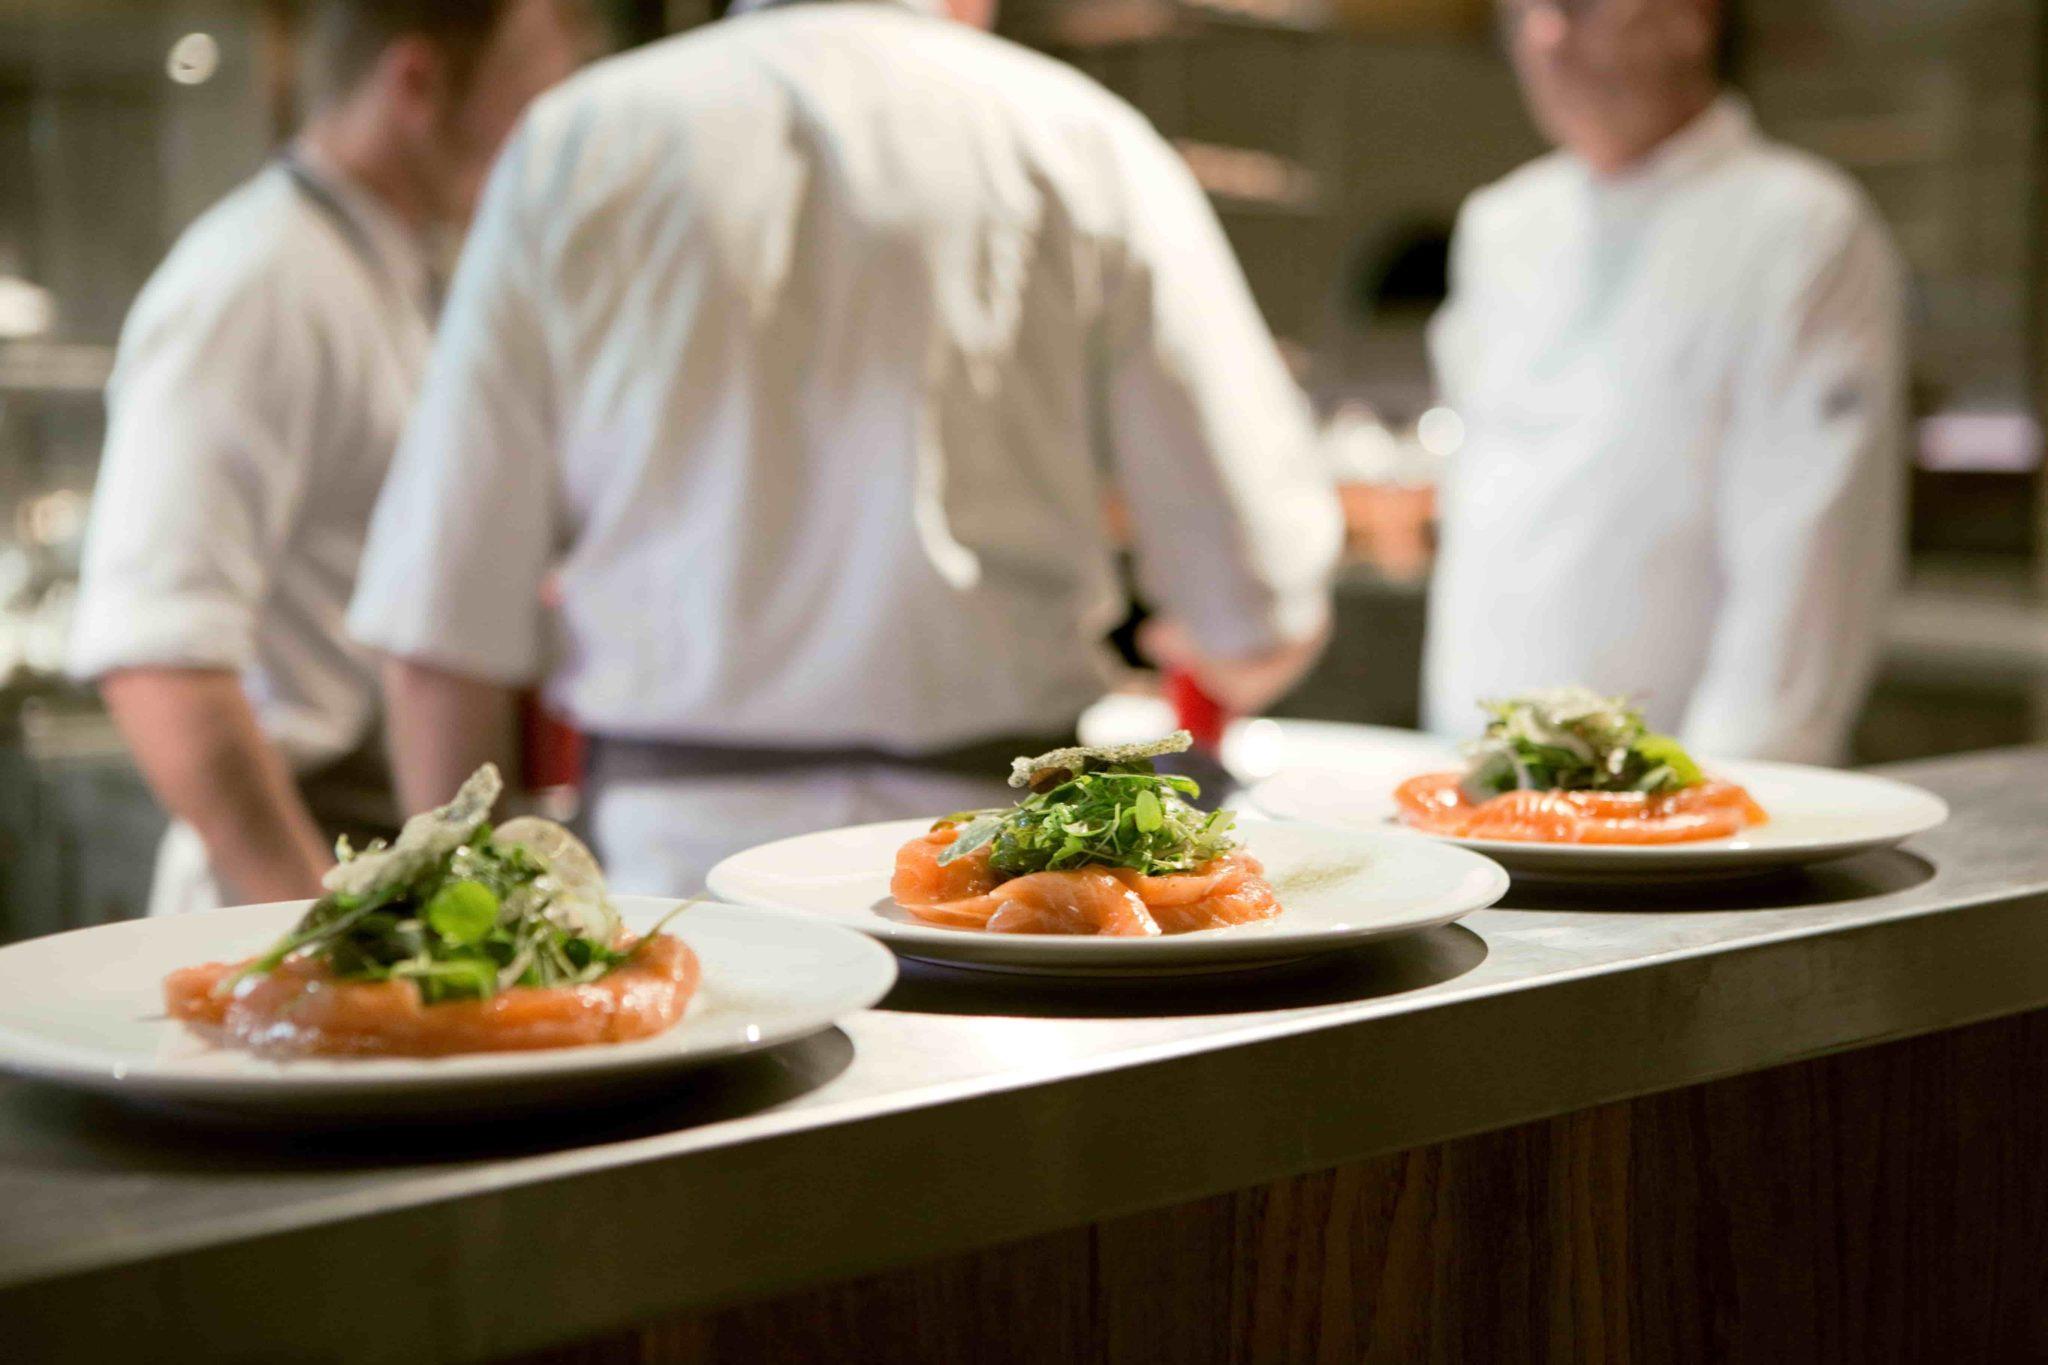 vroeg Utrecht Bunnik restaurant chef zalmgerecht kok keuken